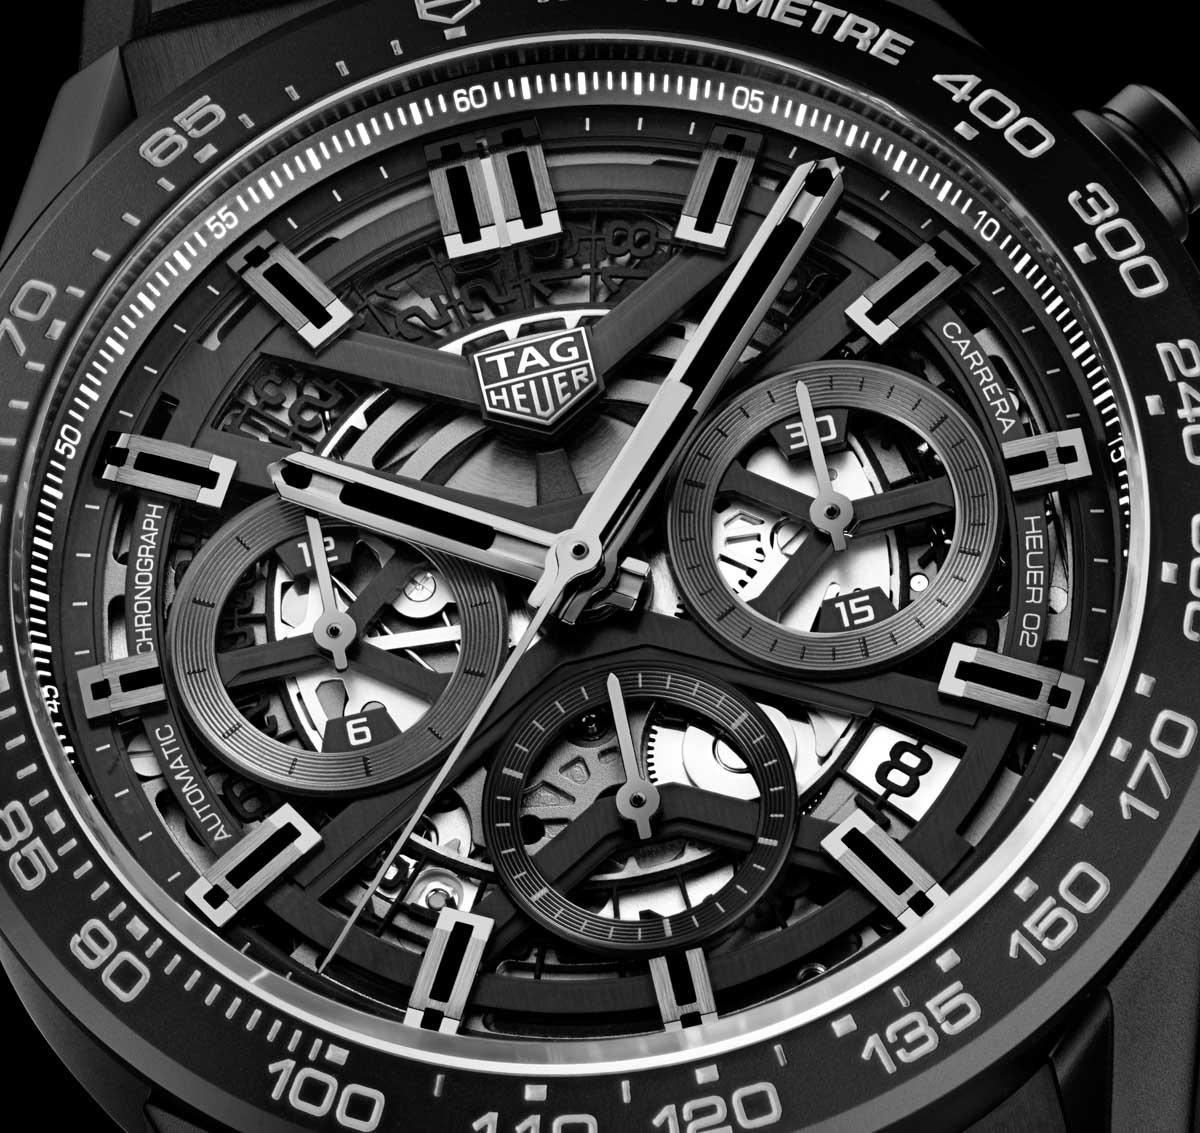 tag-heuer-carrera-heuer-02-heuer02-baselworld-2018-chronograph-ablogtowatch-5.jpg